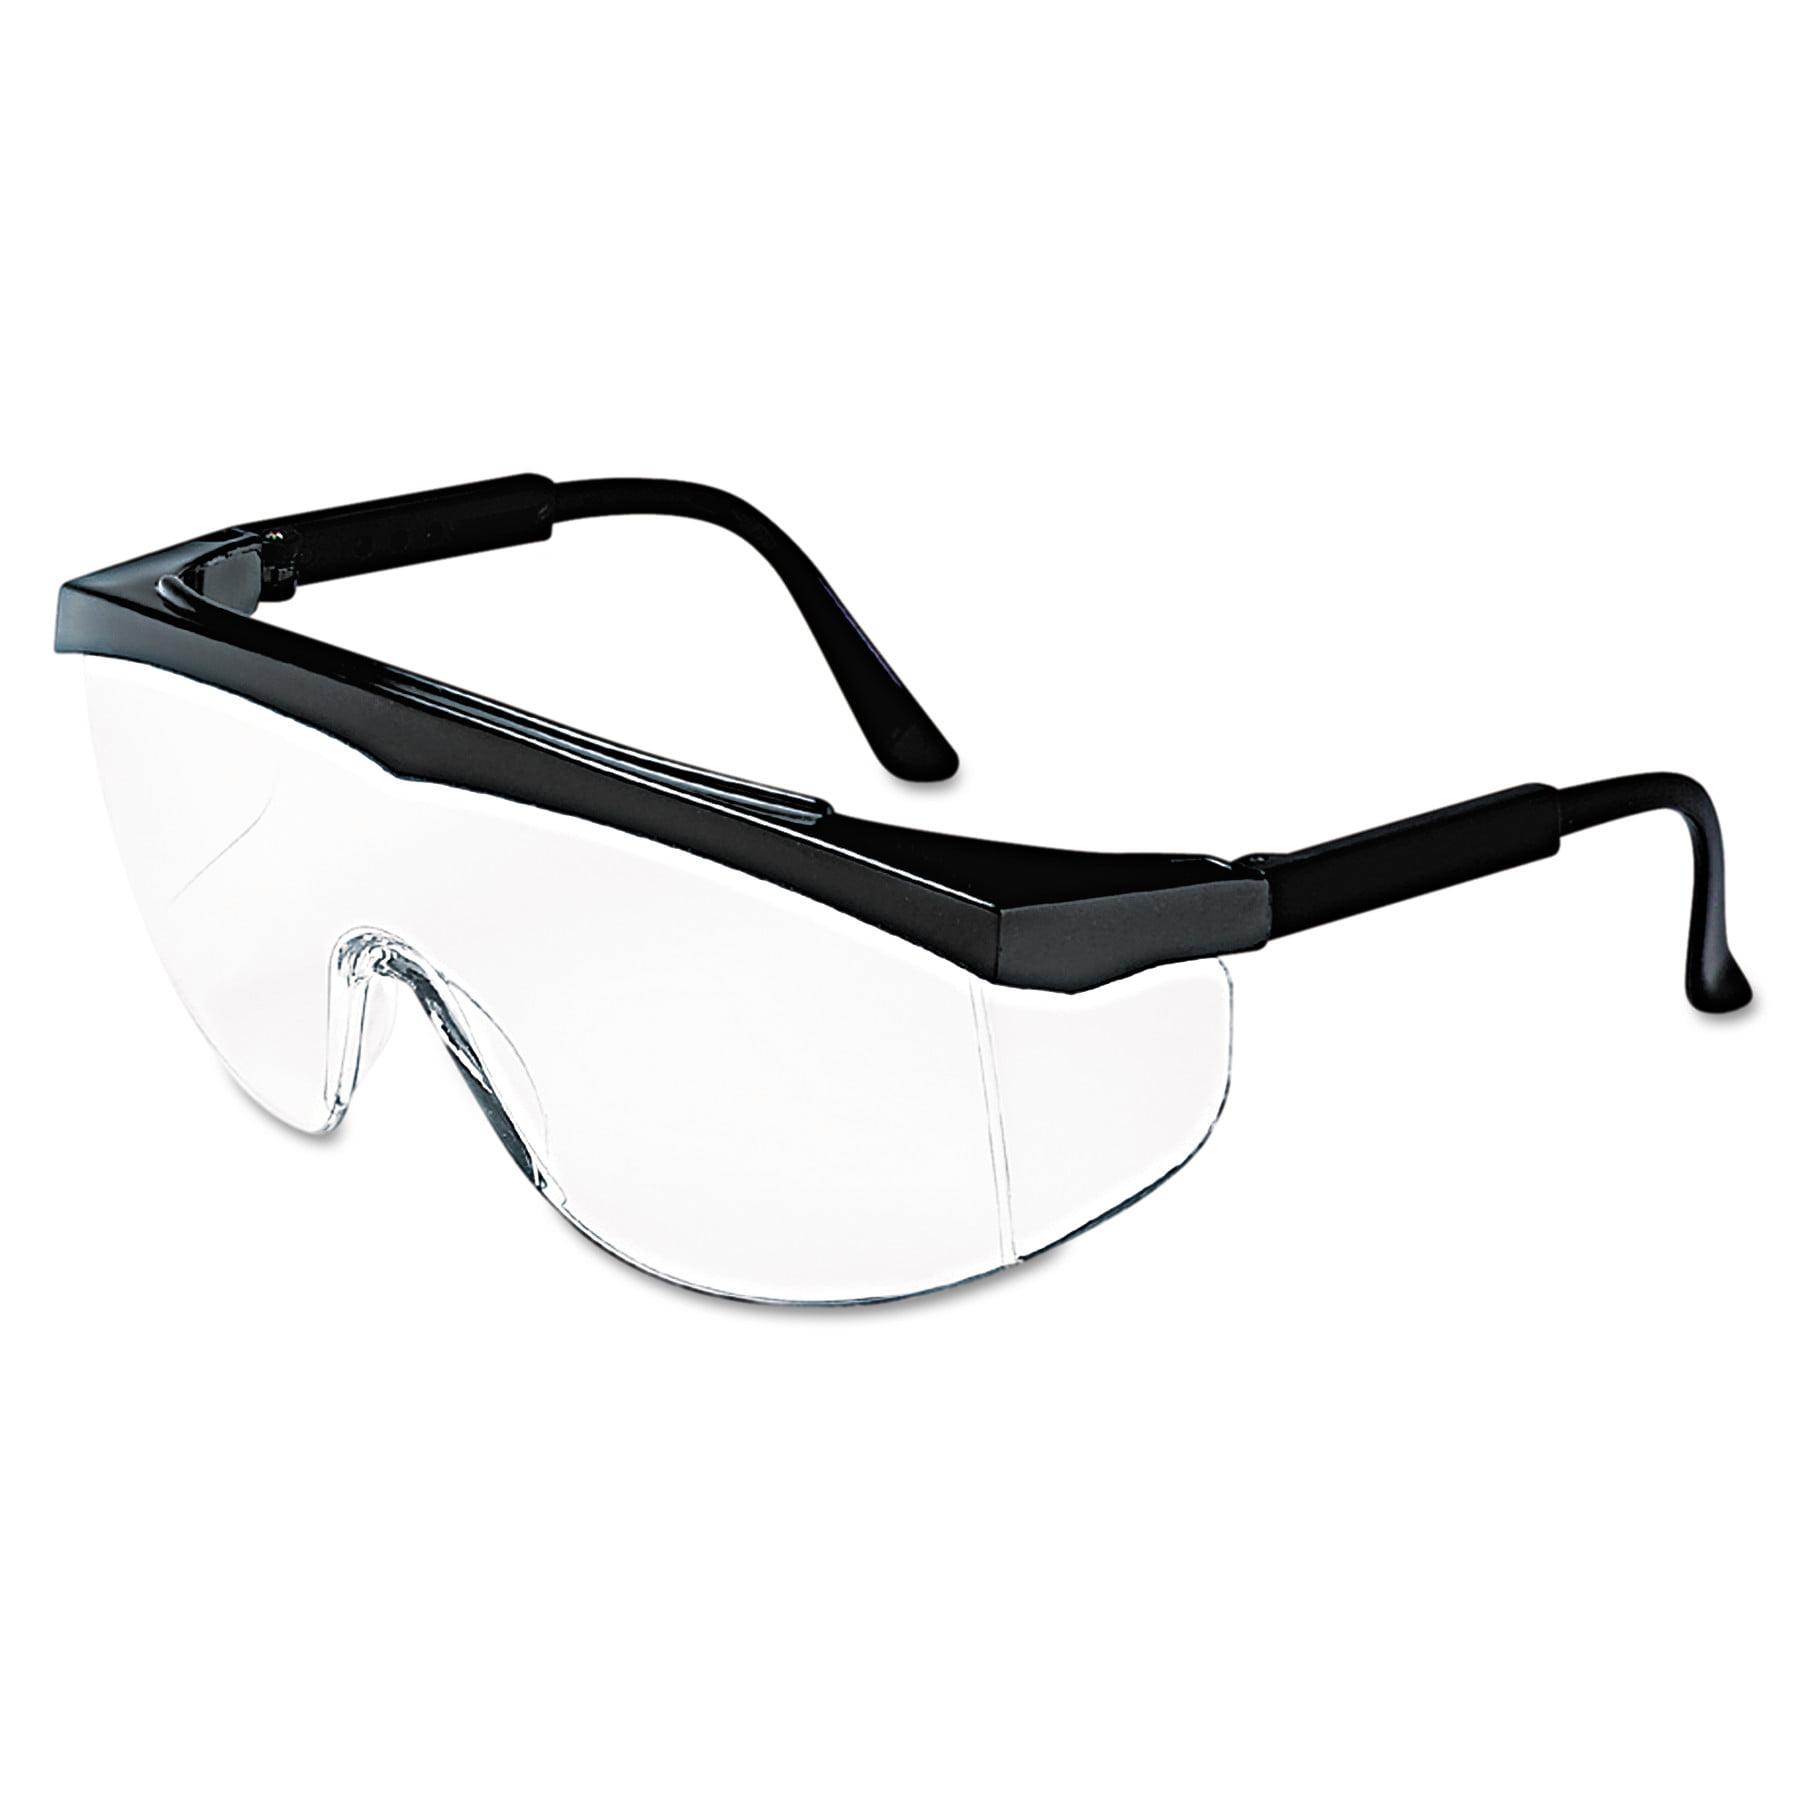 MCR Safety Stratos Safety Glasses, Black Frame, Clear Lens